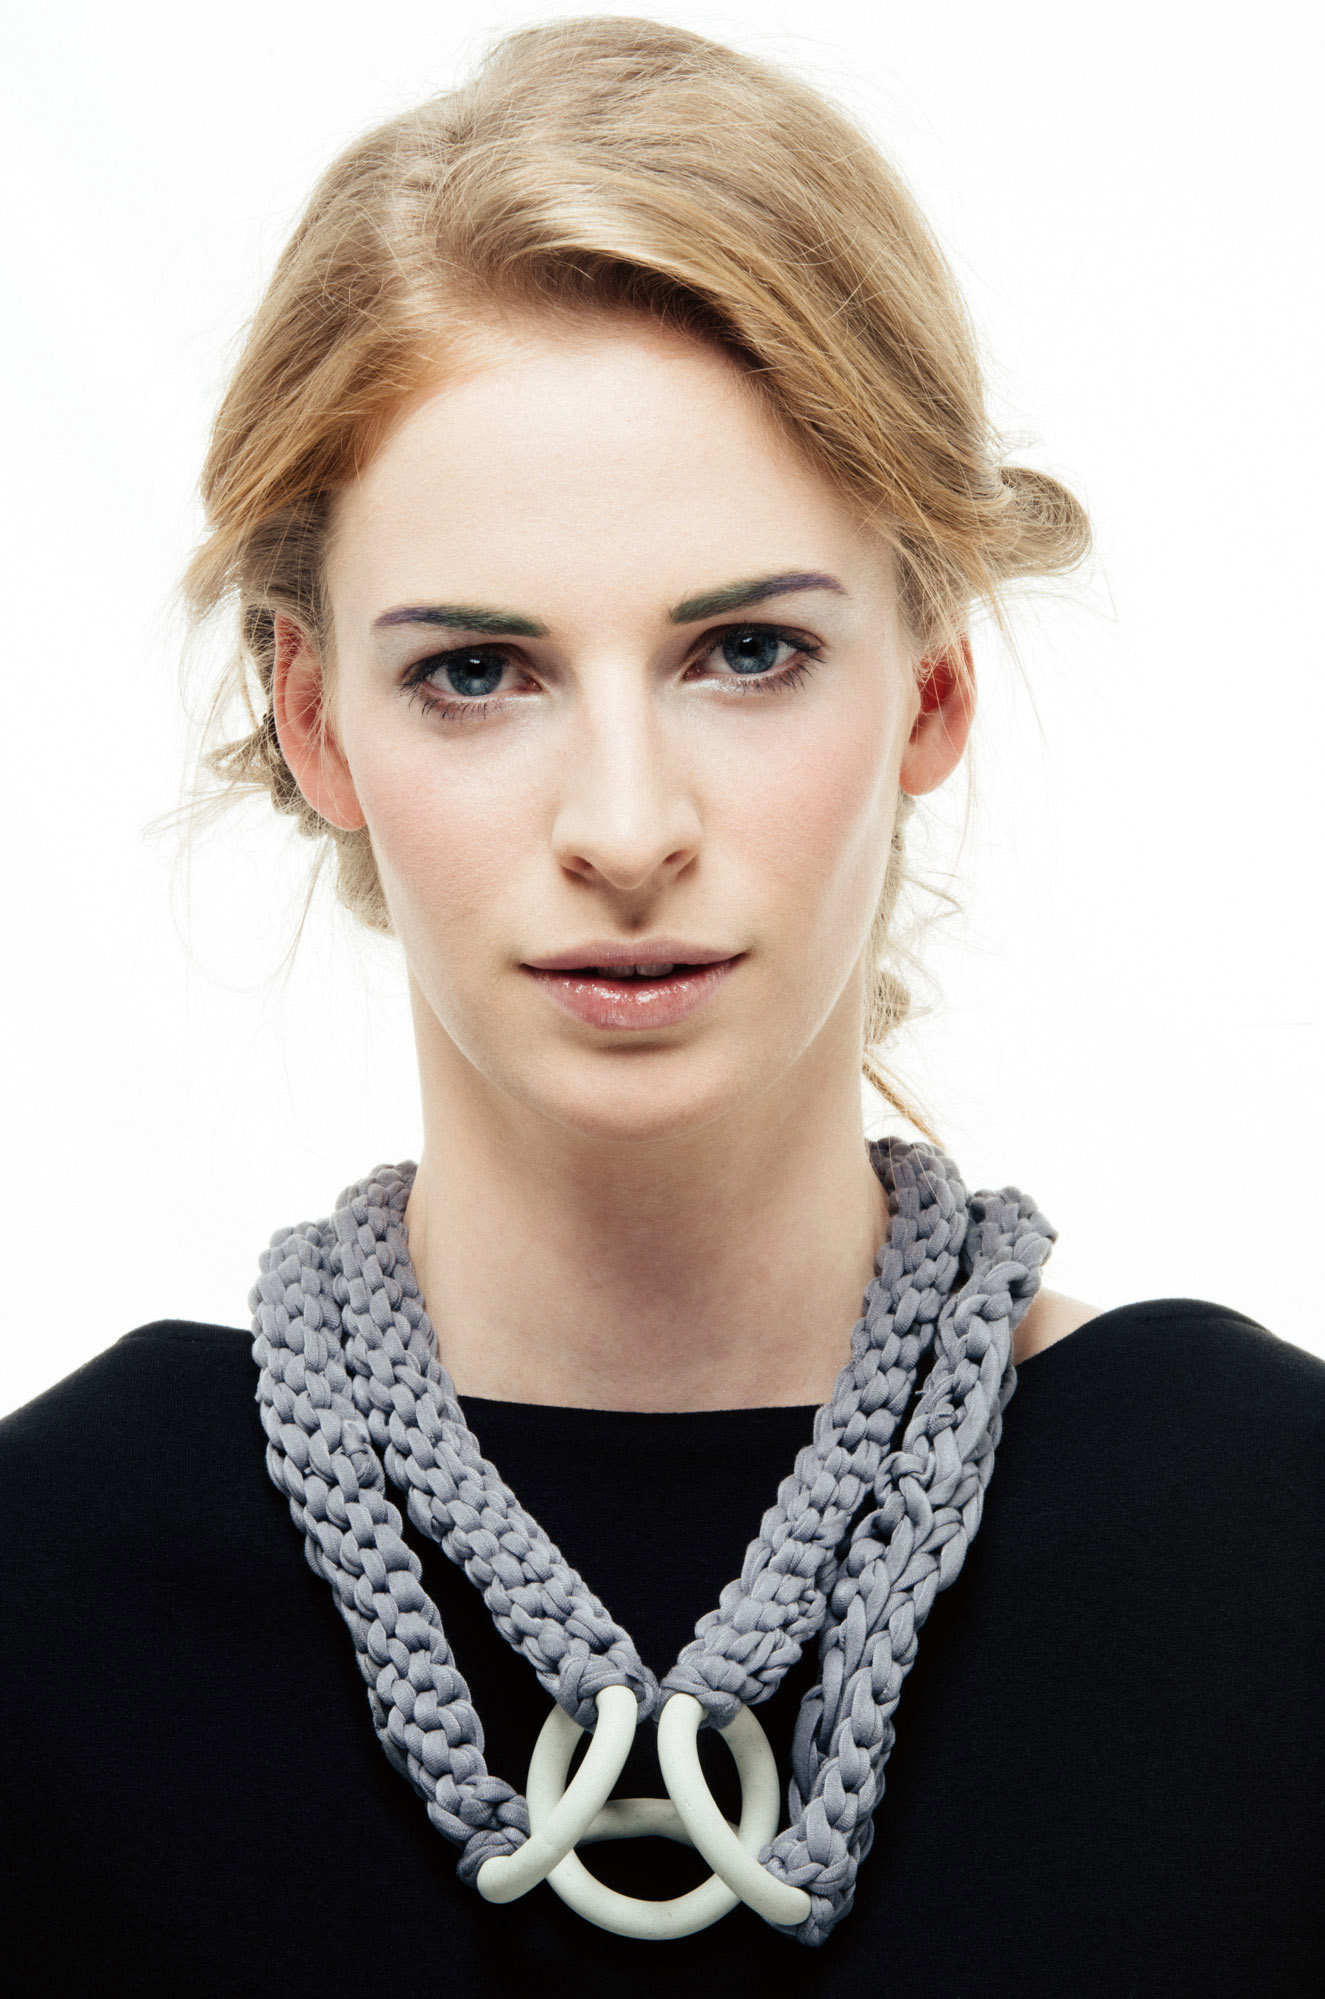 Bocco necklace by Anna Borshi 05.jpg